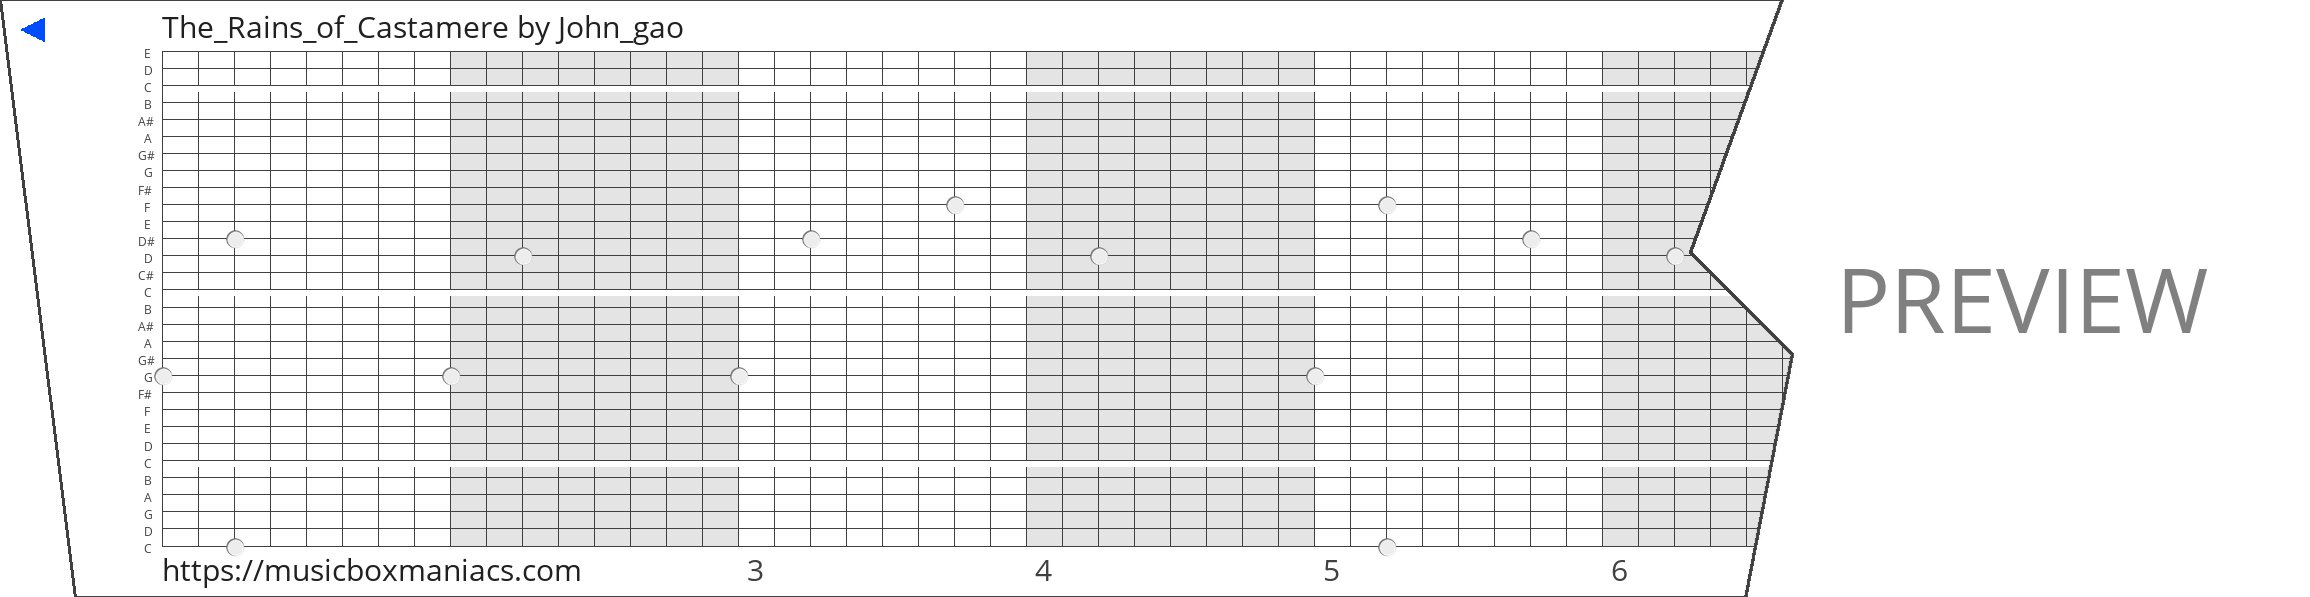 The_Rains_of_Castamere 30 note music box paper strip